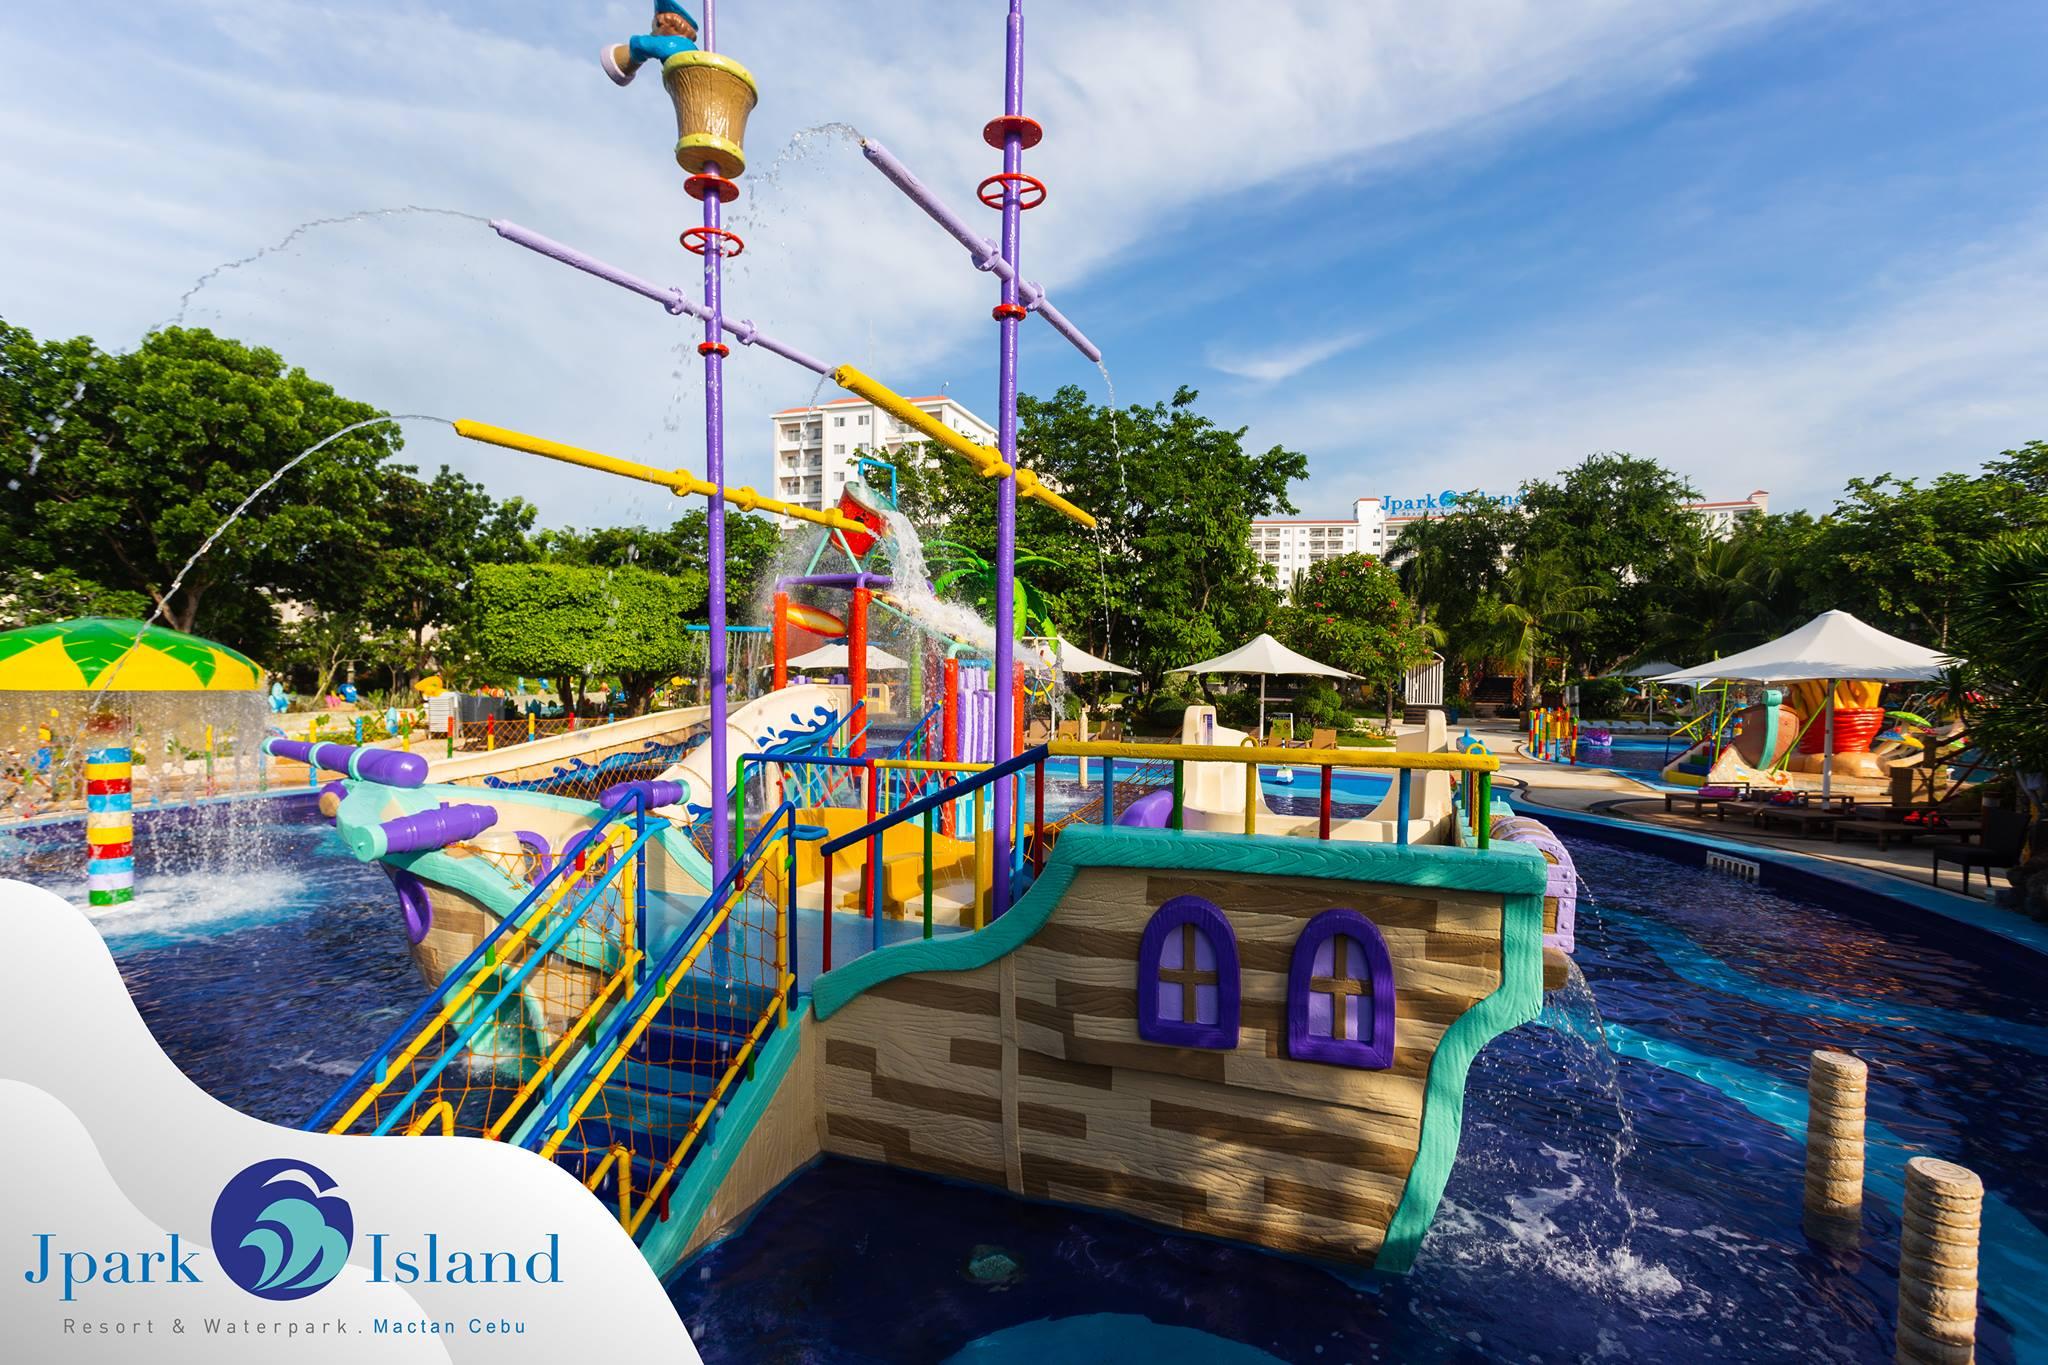 Photo from JPark Island Resort